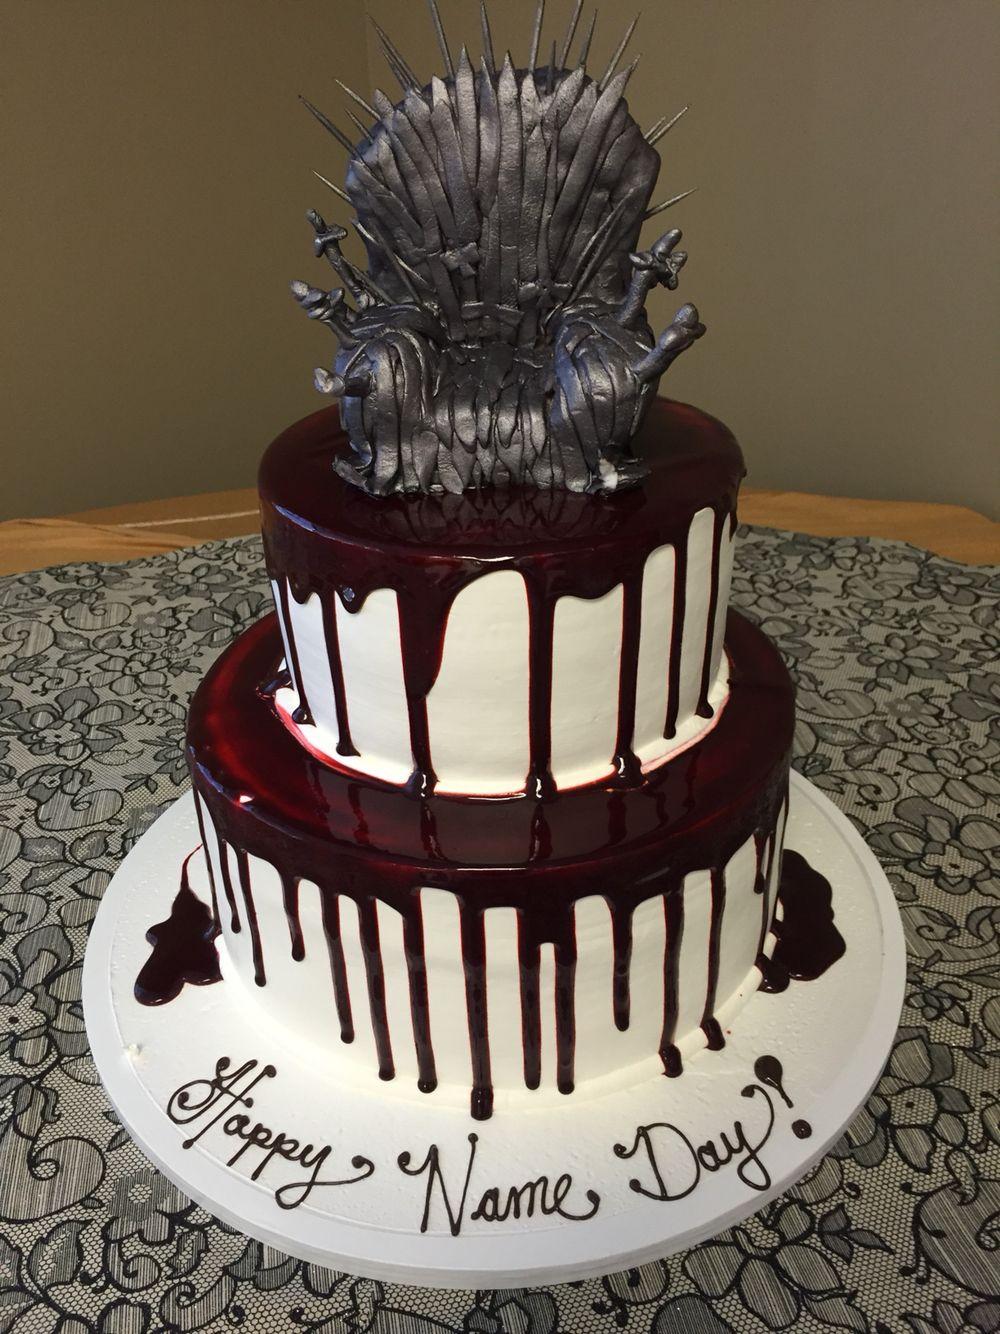 Cake from Portos in Glendale Homemade Cake Topper Game of